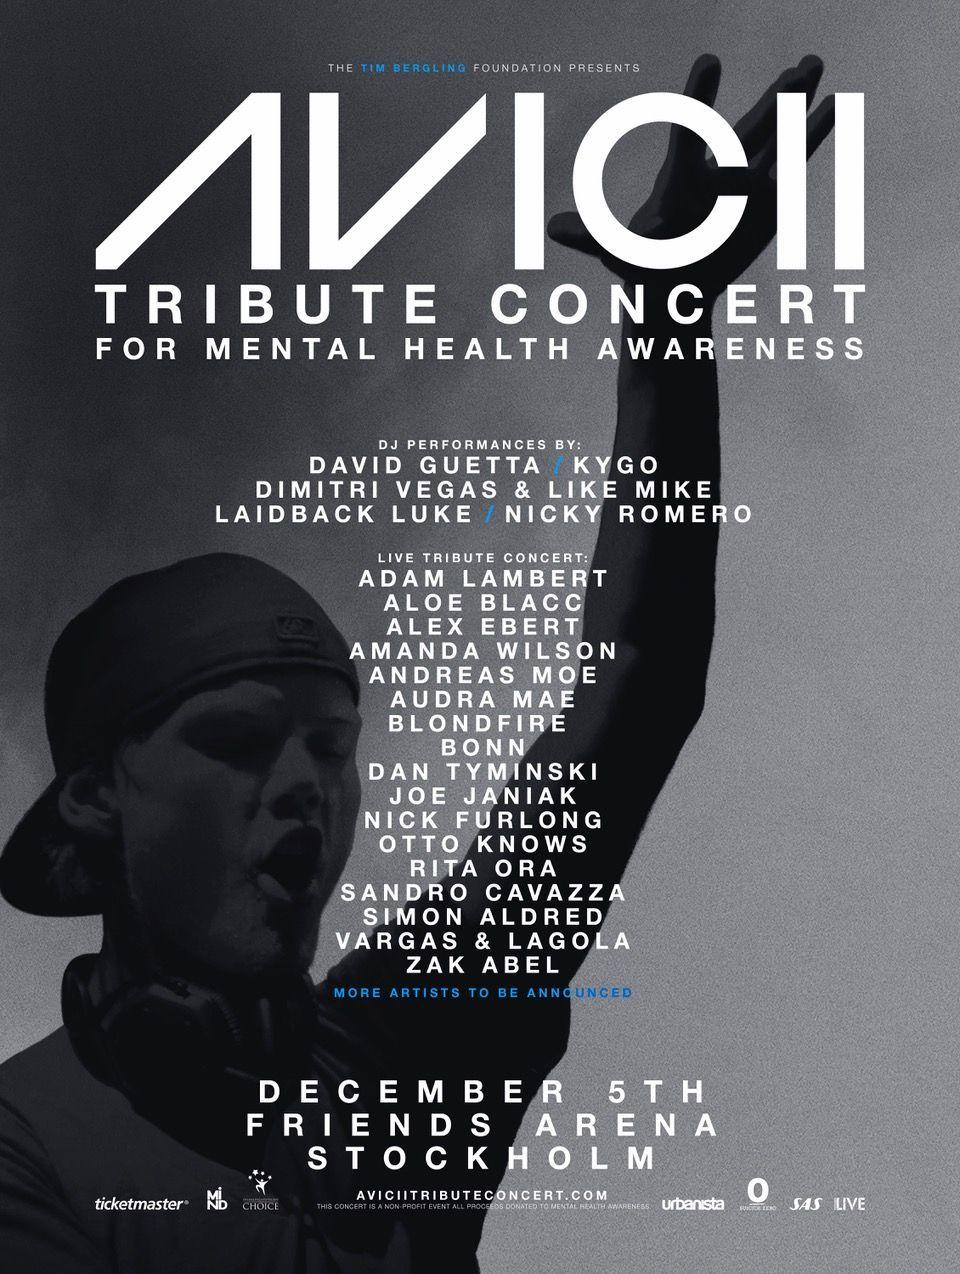 Avicii Tribute Concert Poster